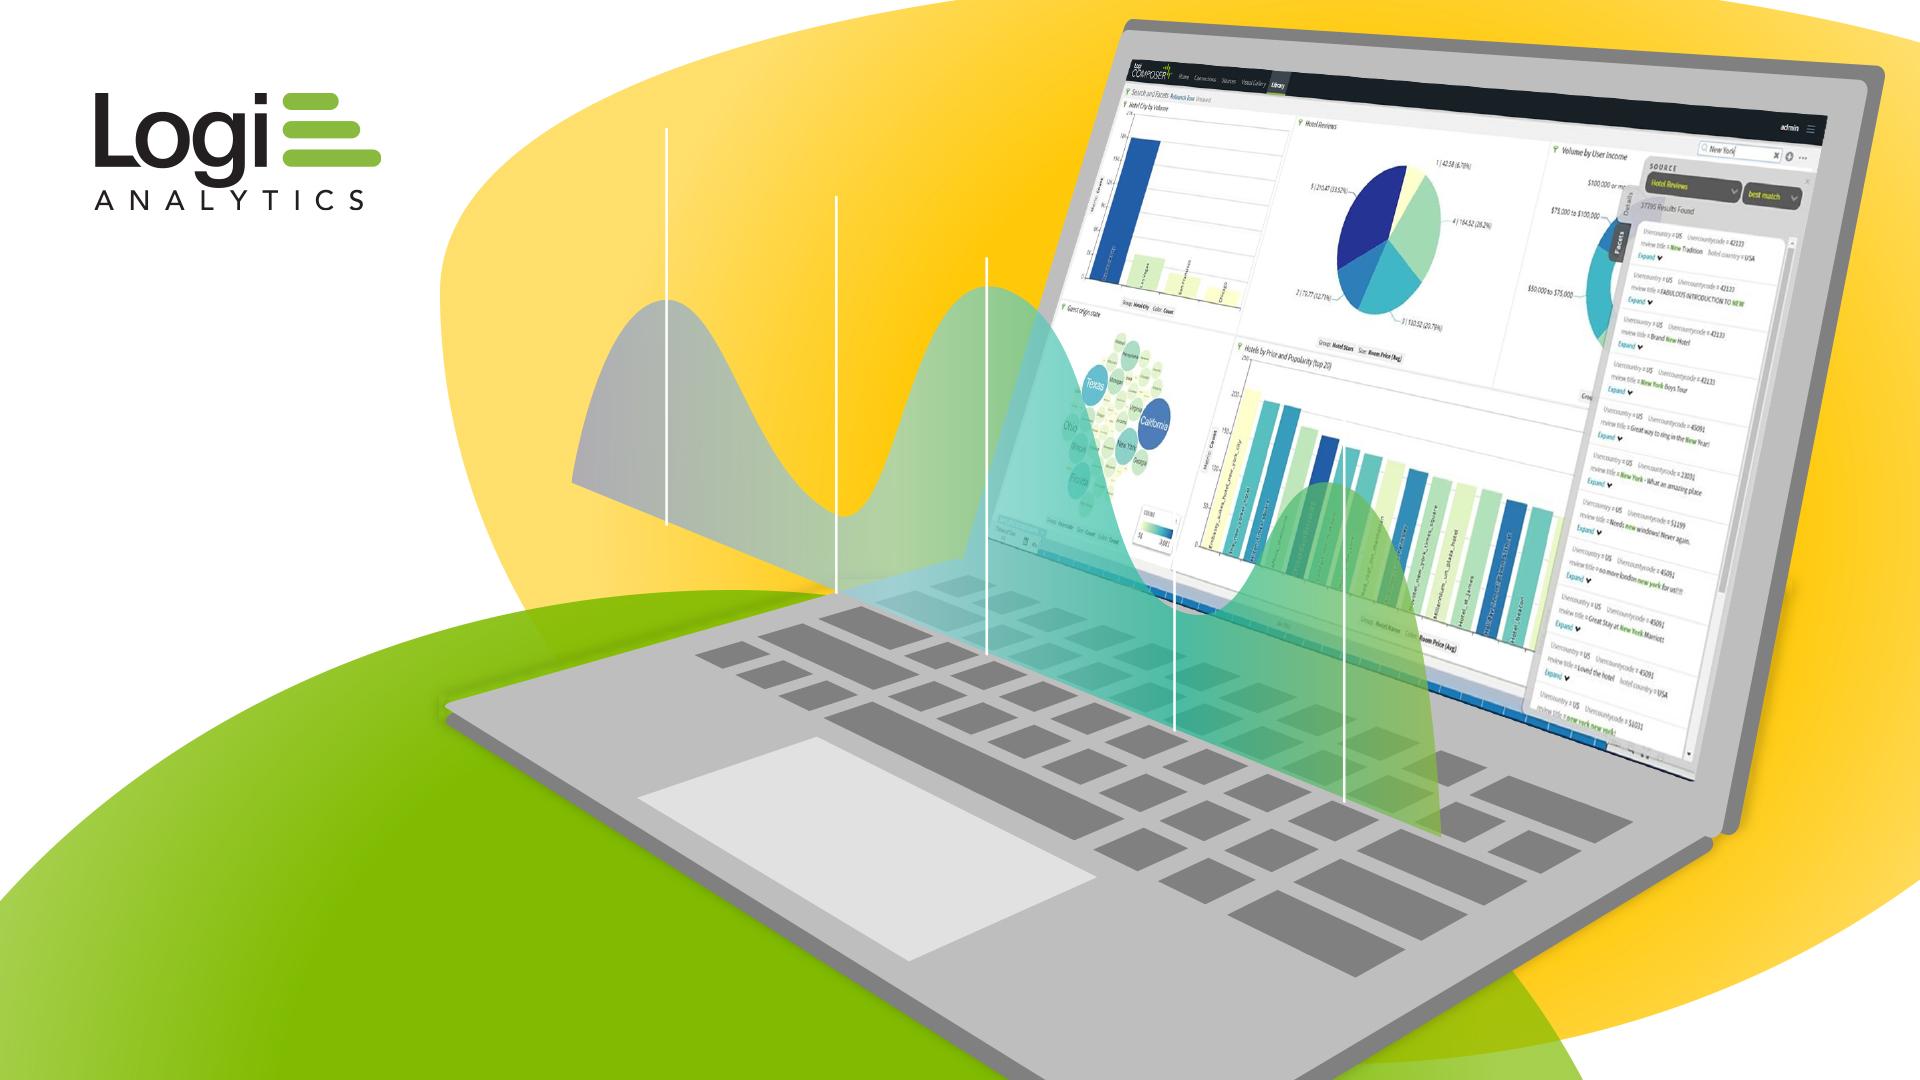 Logi Analytics Laptop Campaign